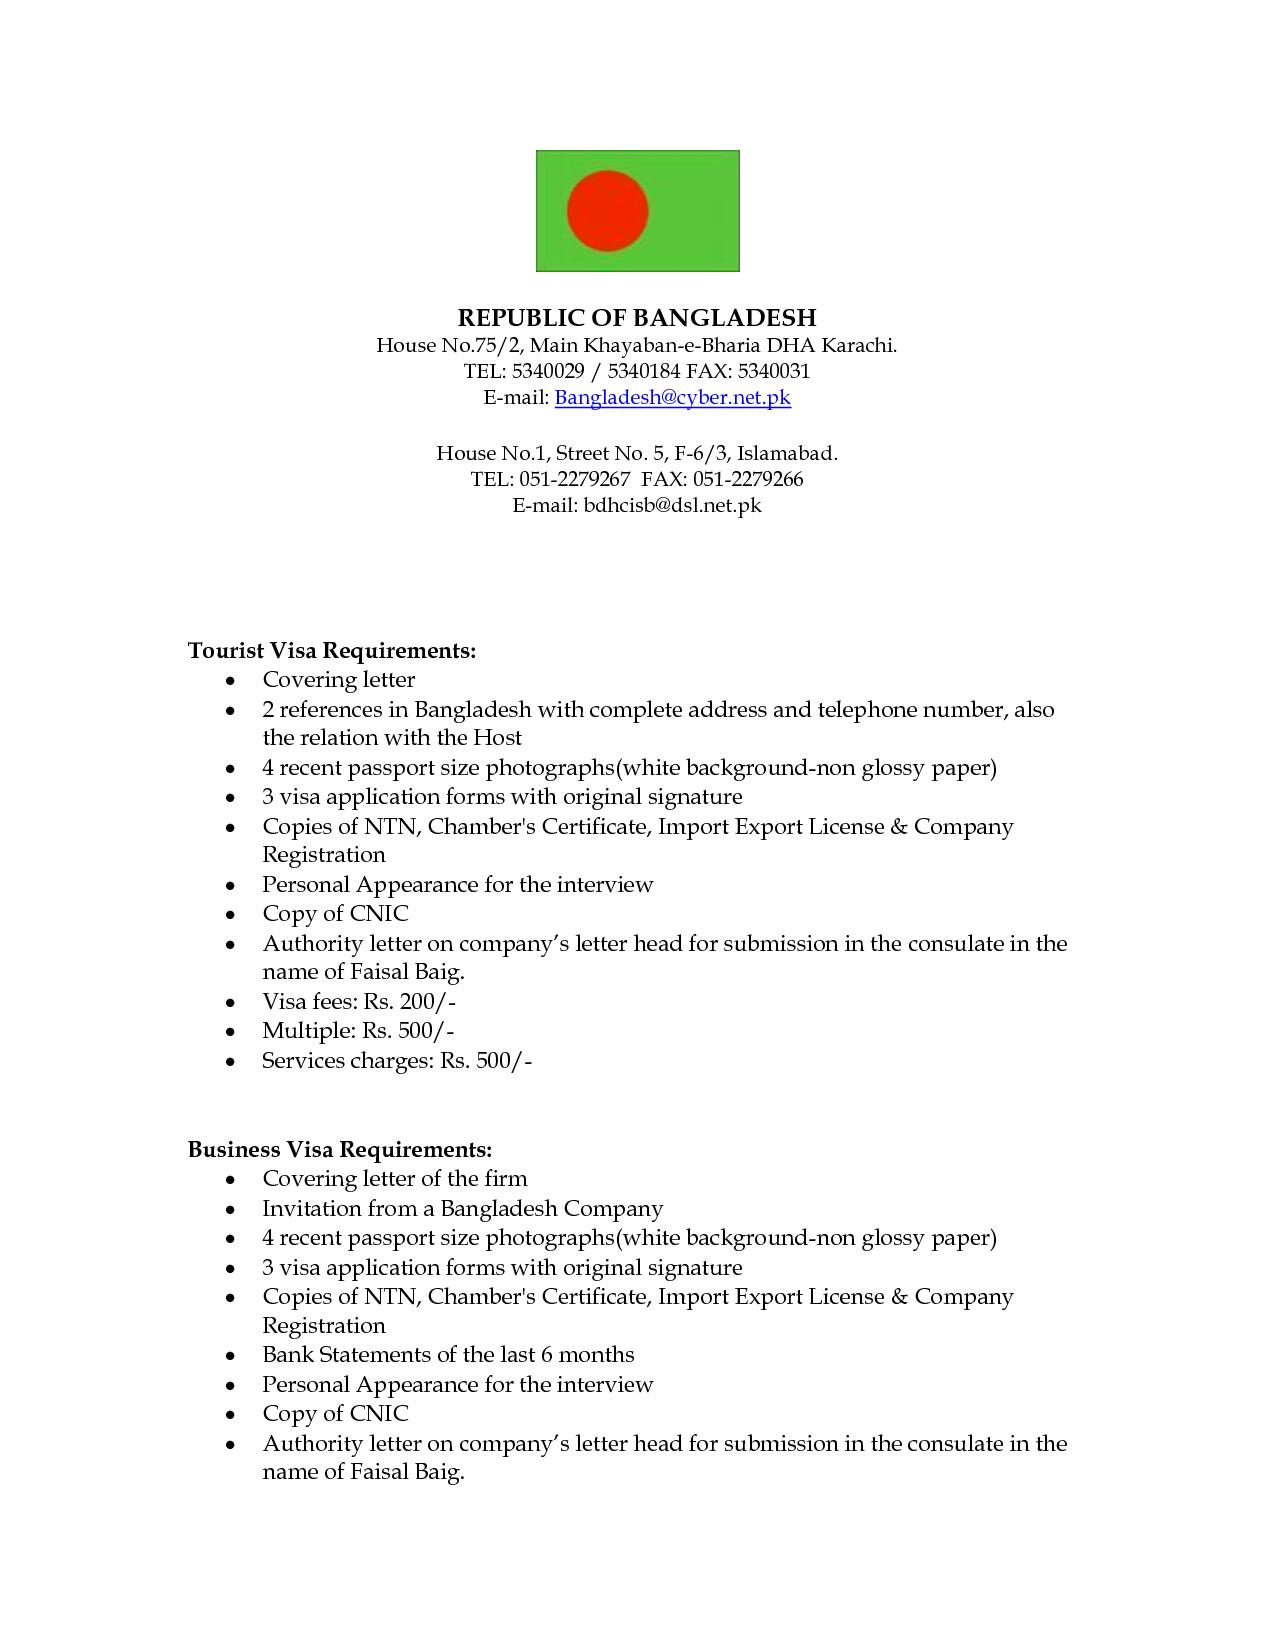 covering letter for visa application